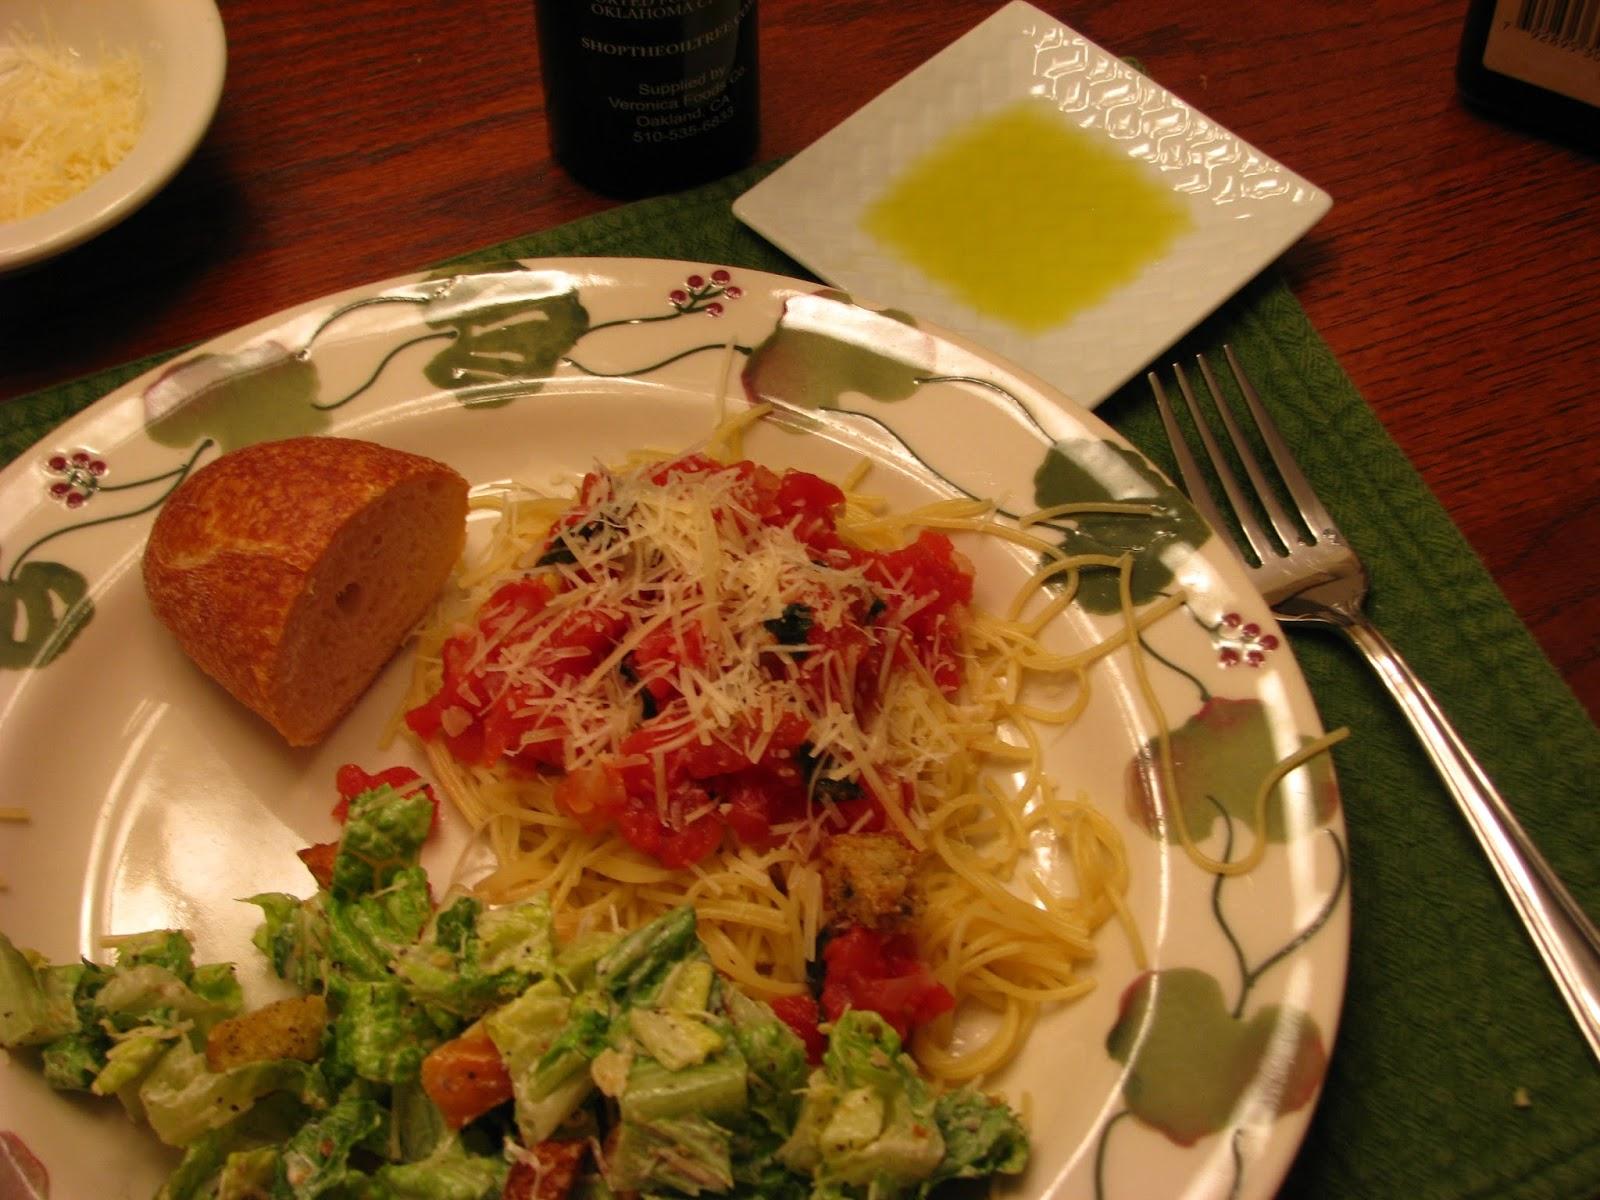 Capellini Pomodoro Olive Garden TheFultonGirls:...